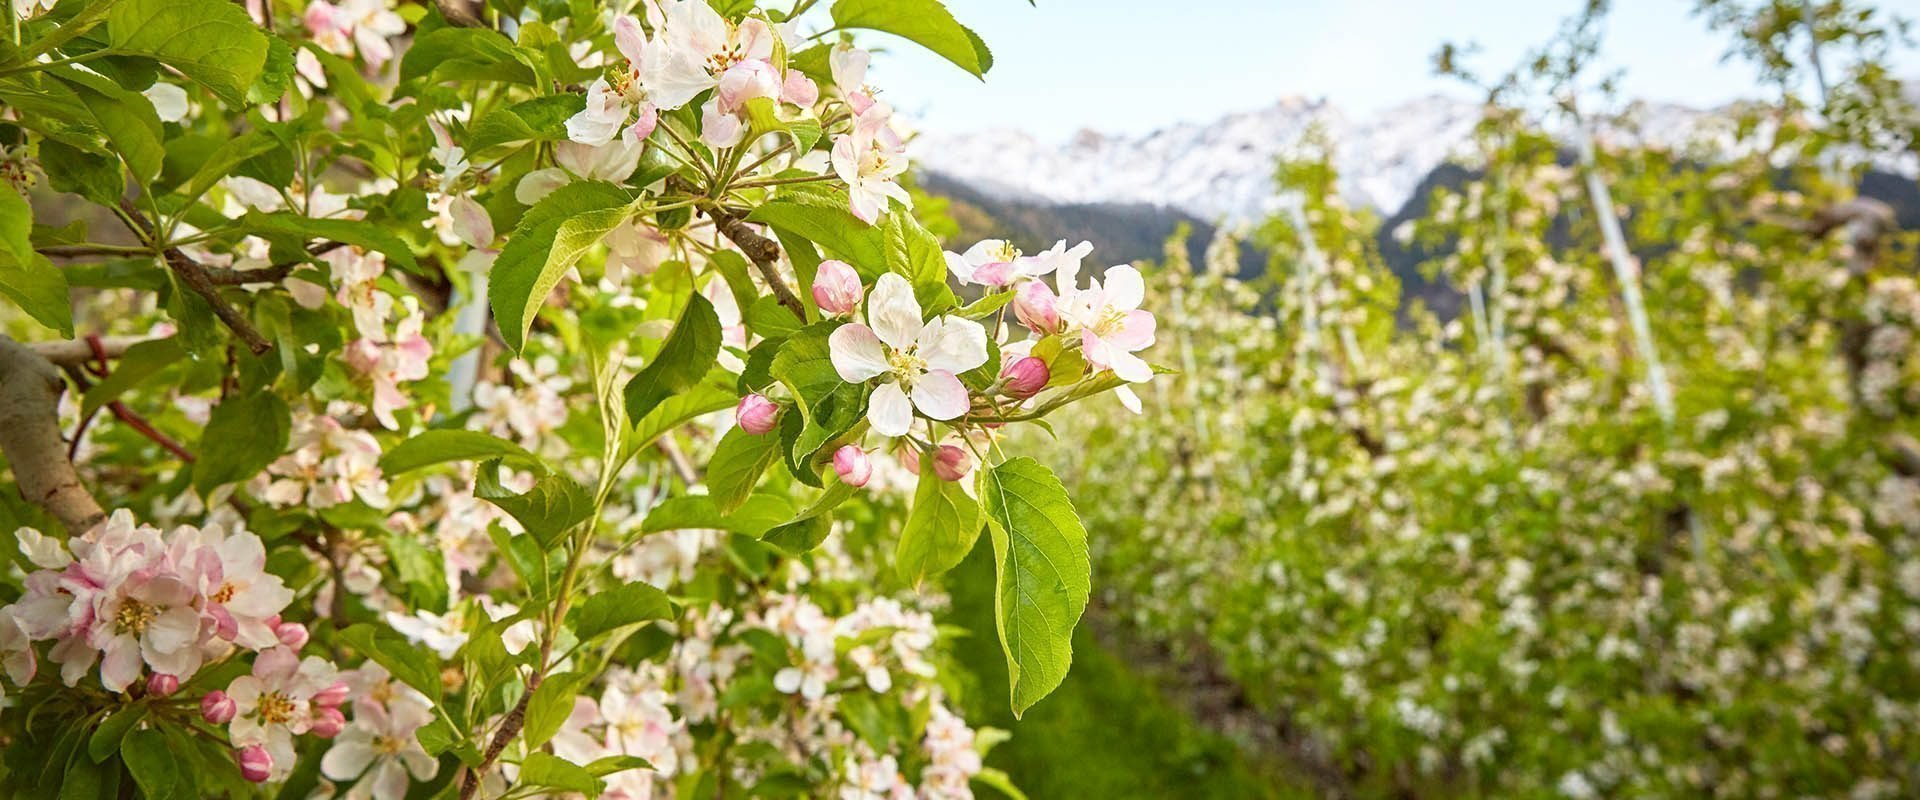 Frühlingsurlaub in Südtirol